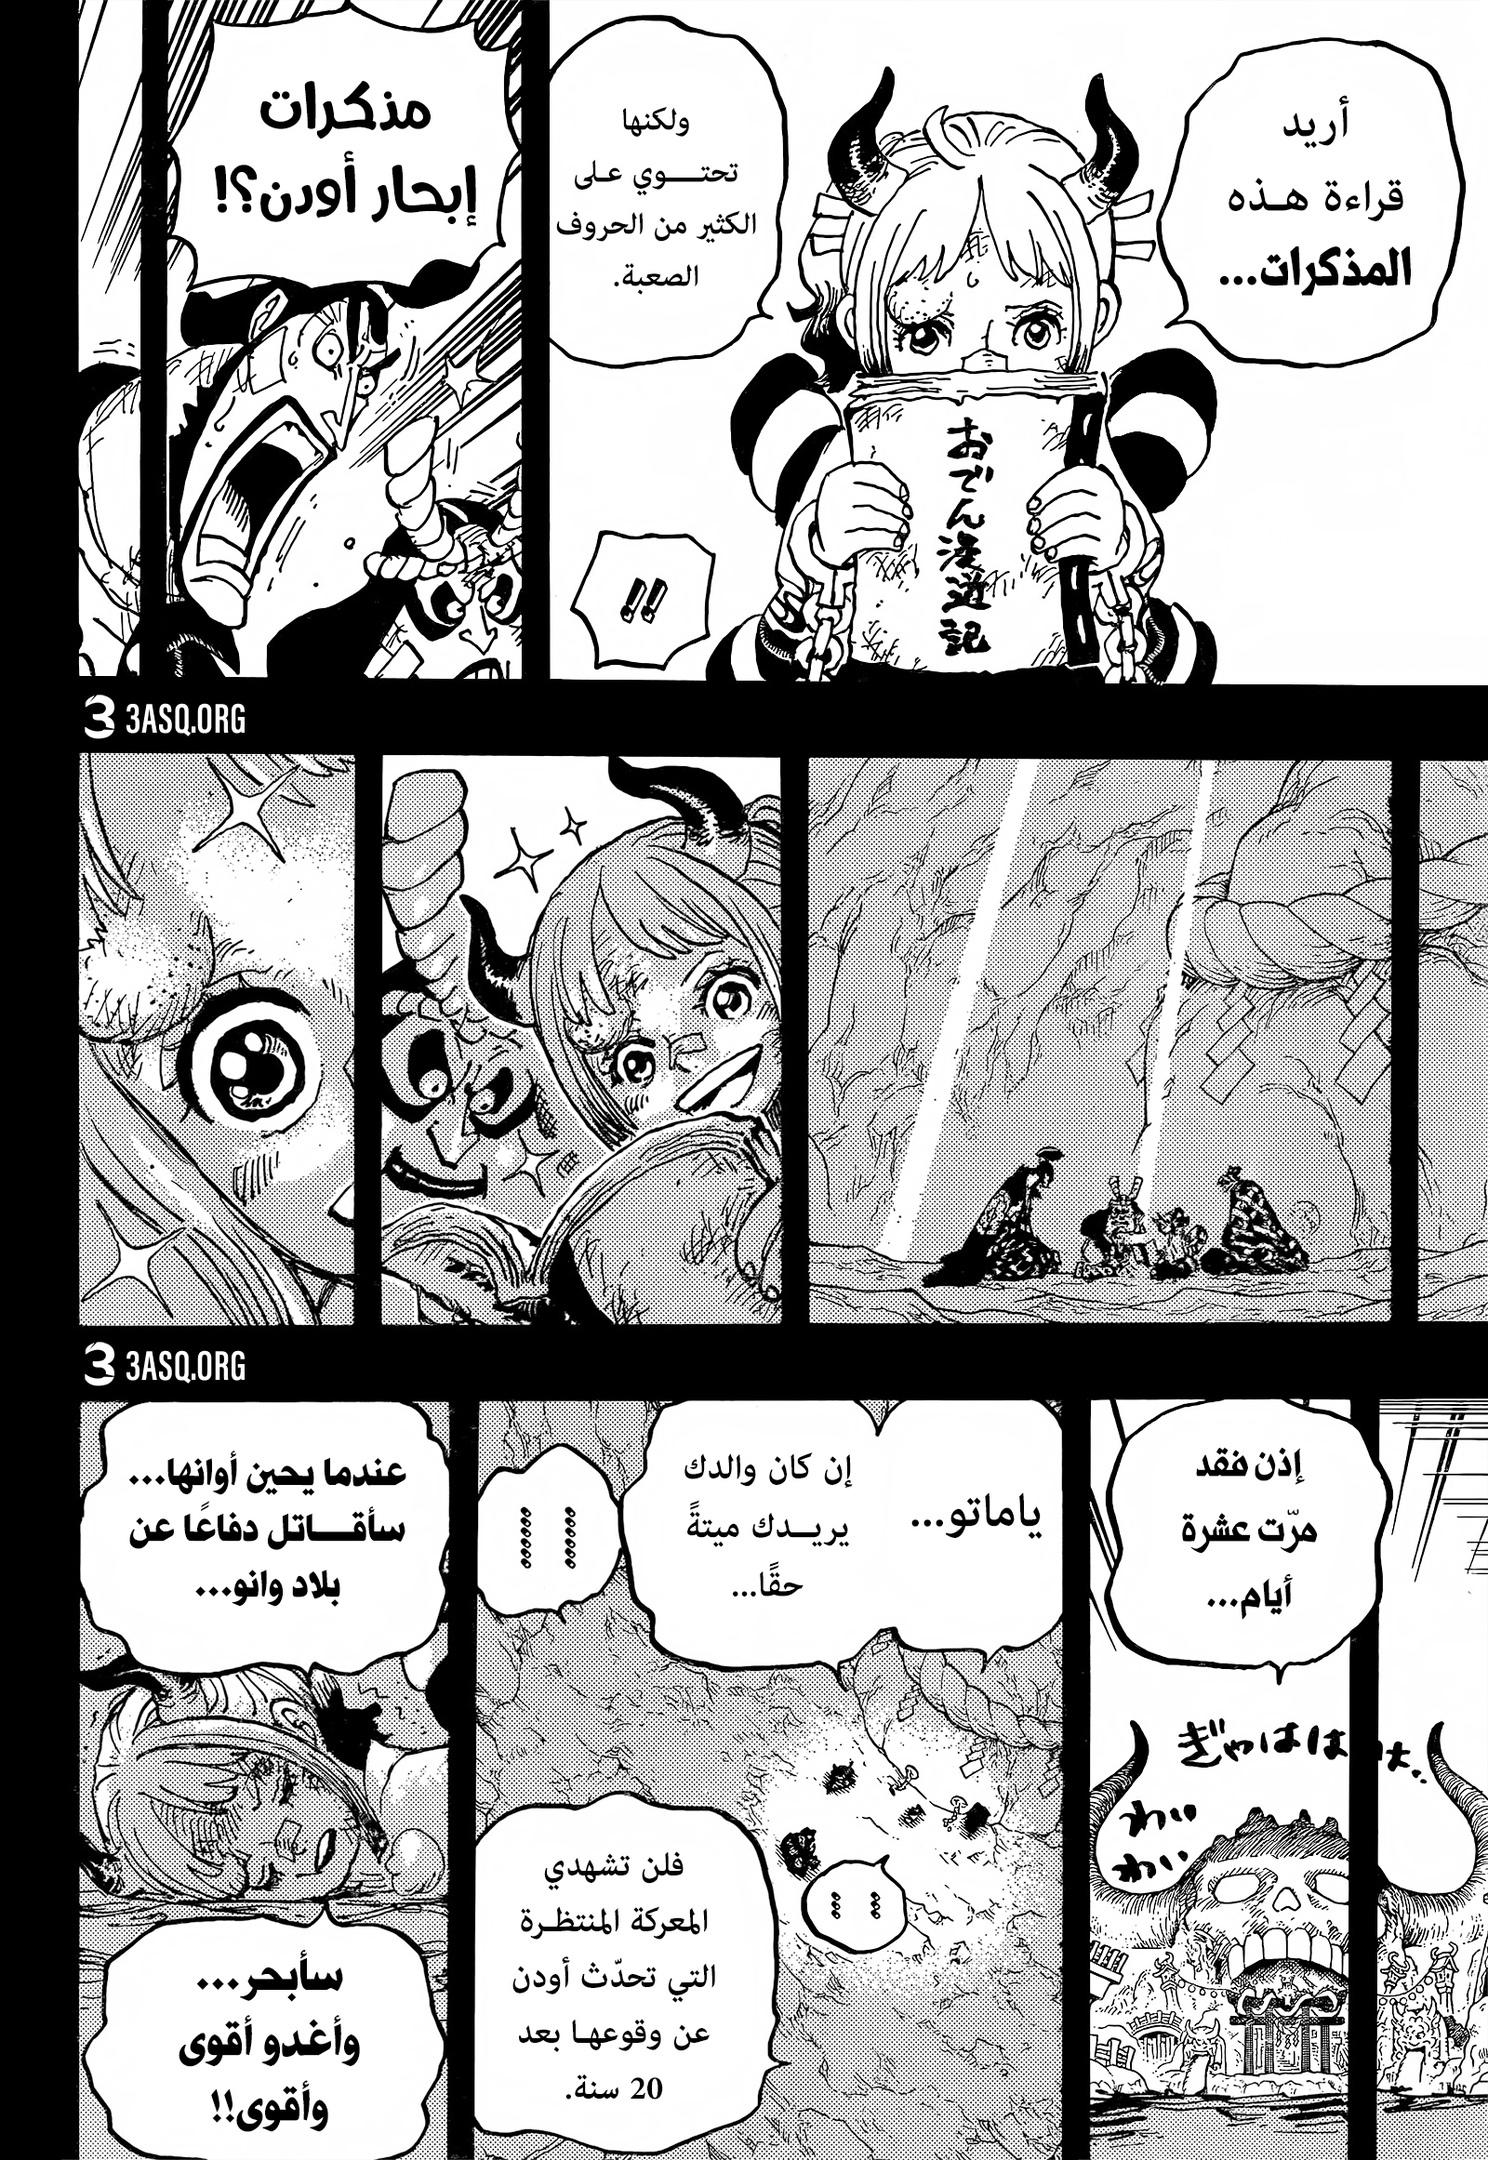 One Piece Arab 1024, image №16